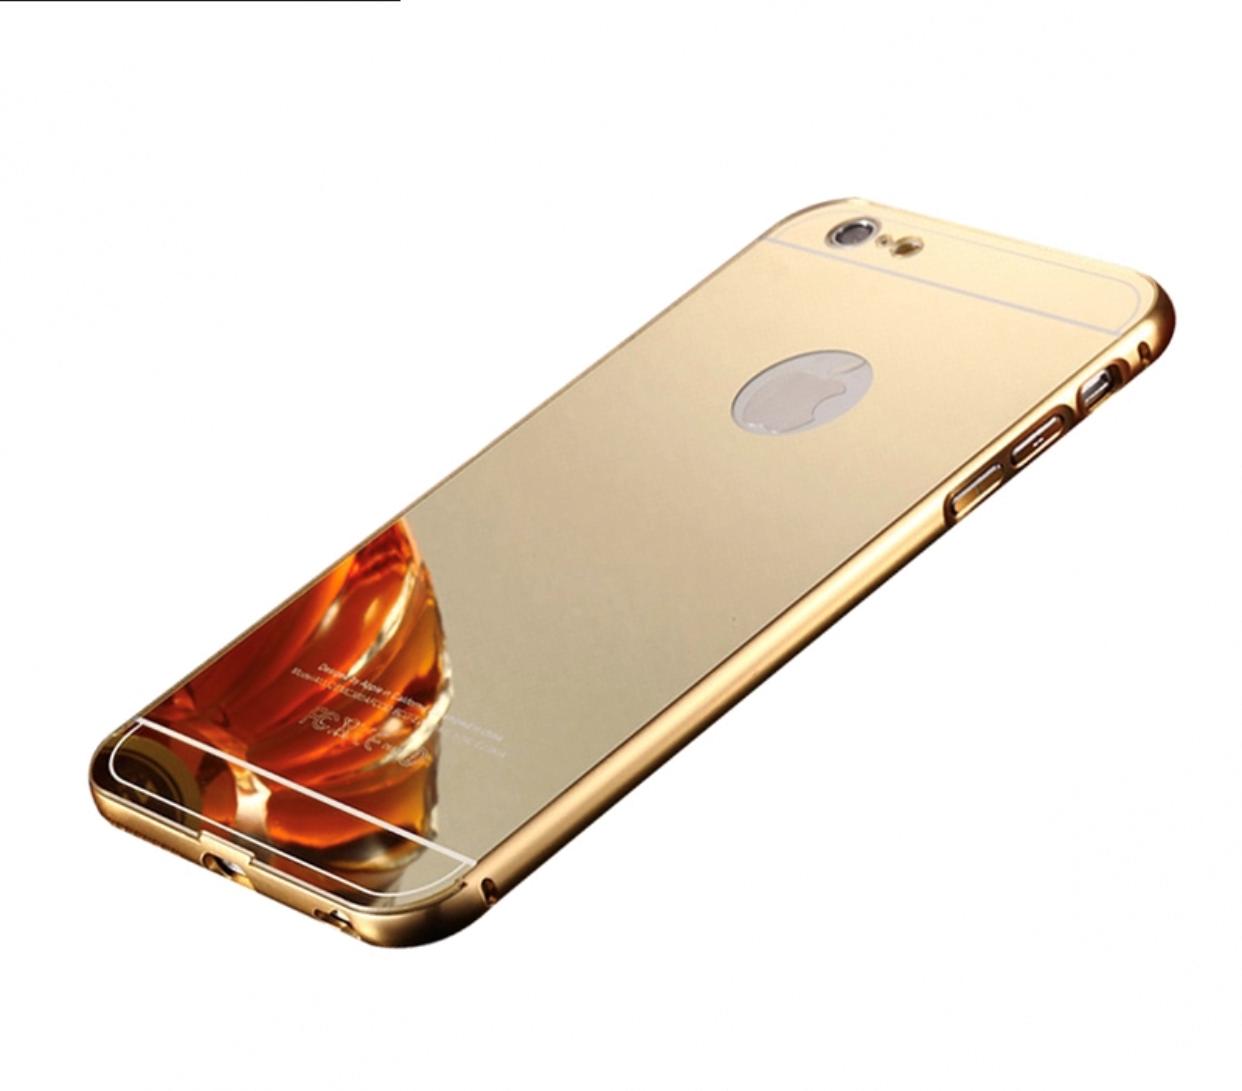 Чехол для Iphone 6 plus/6s plus зеркальный